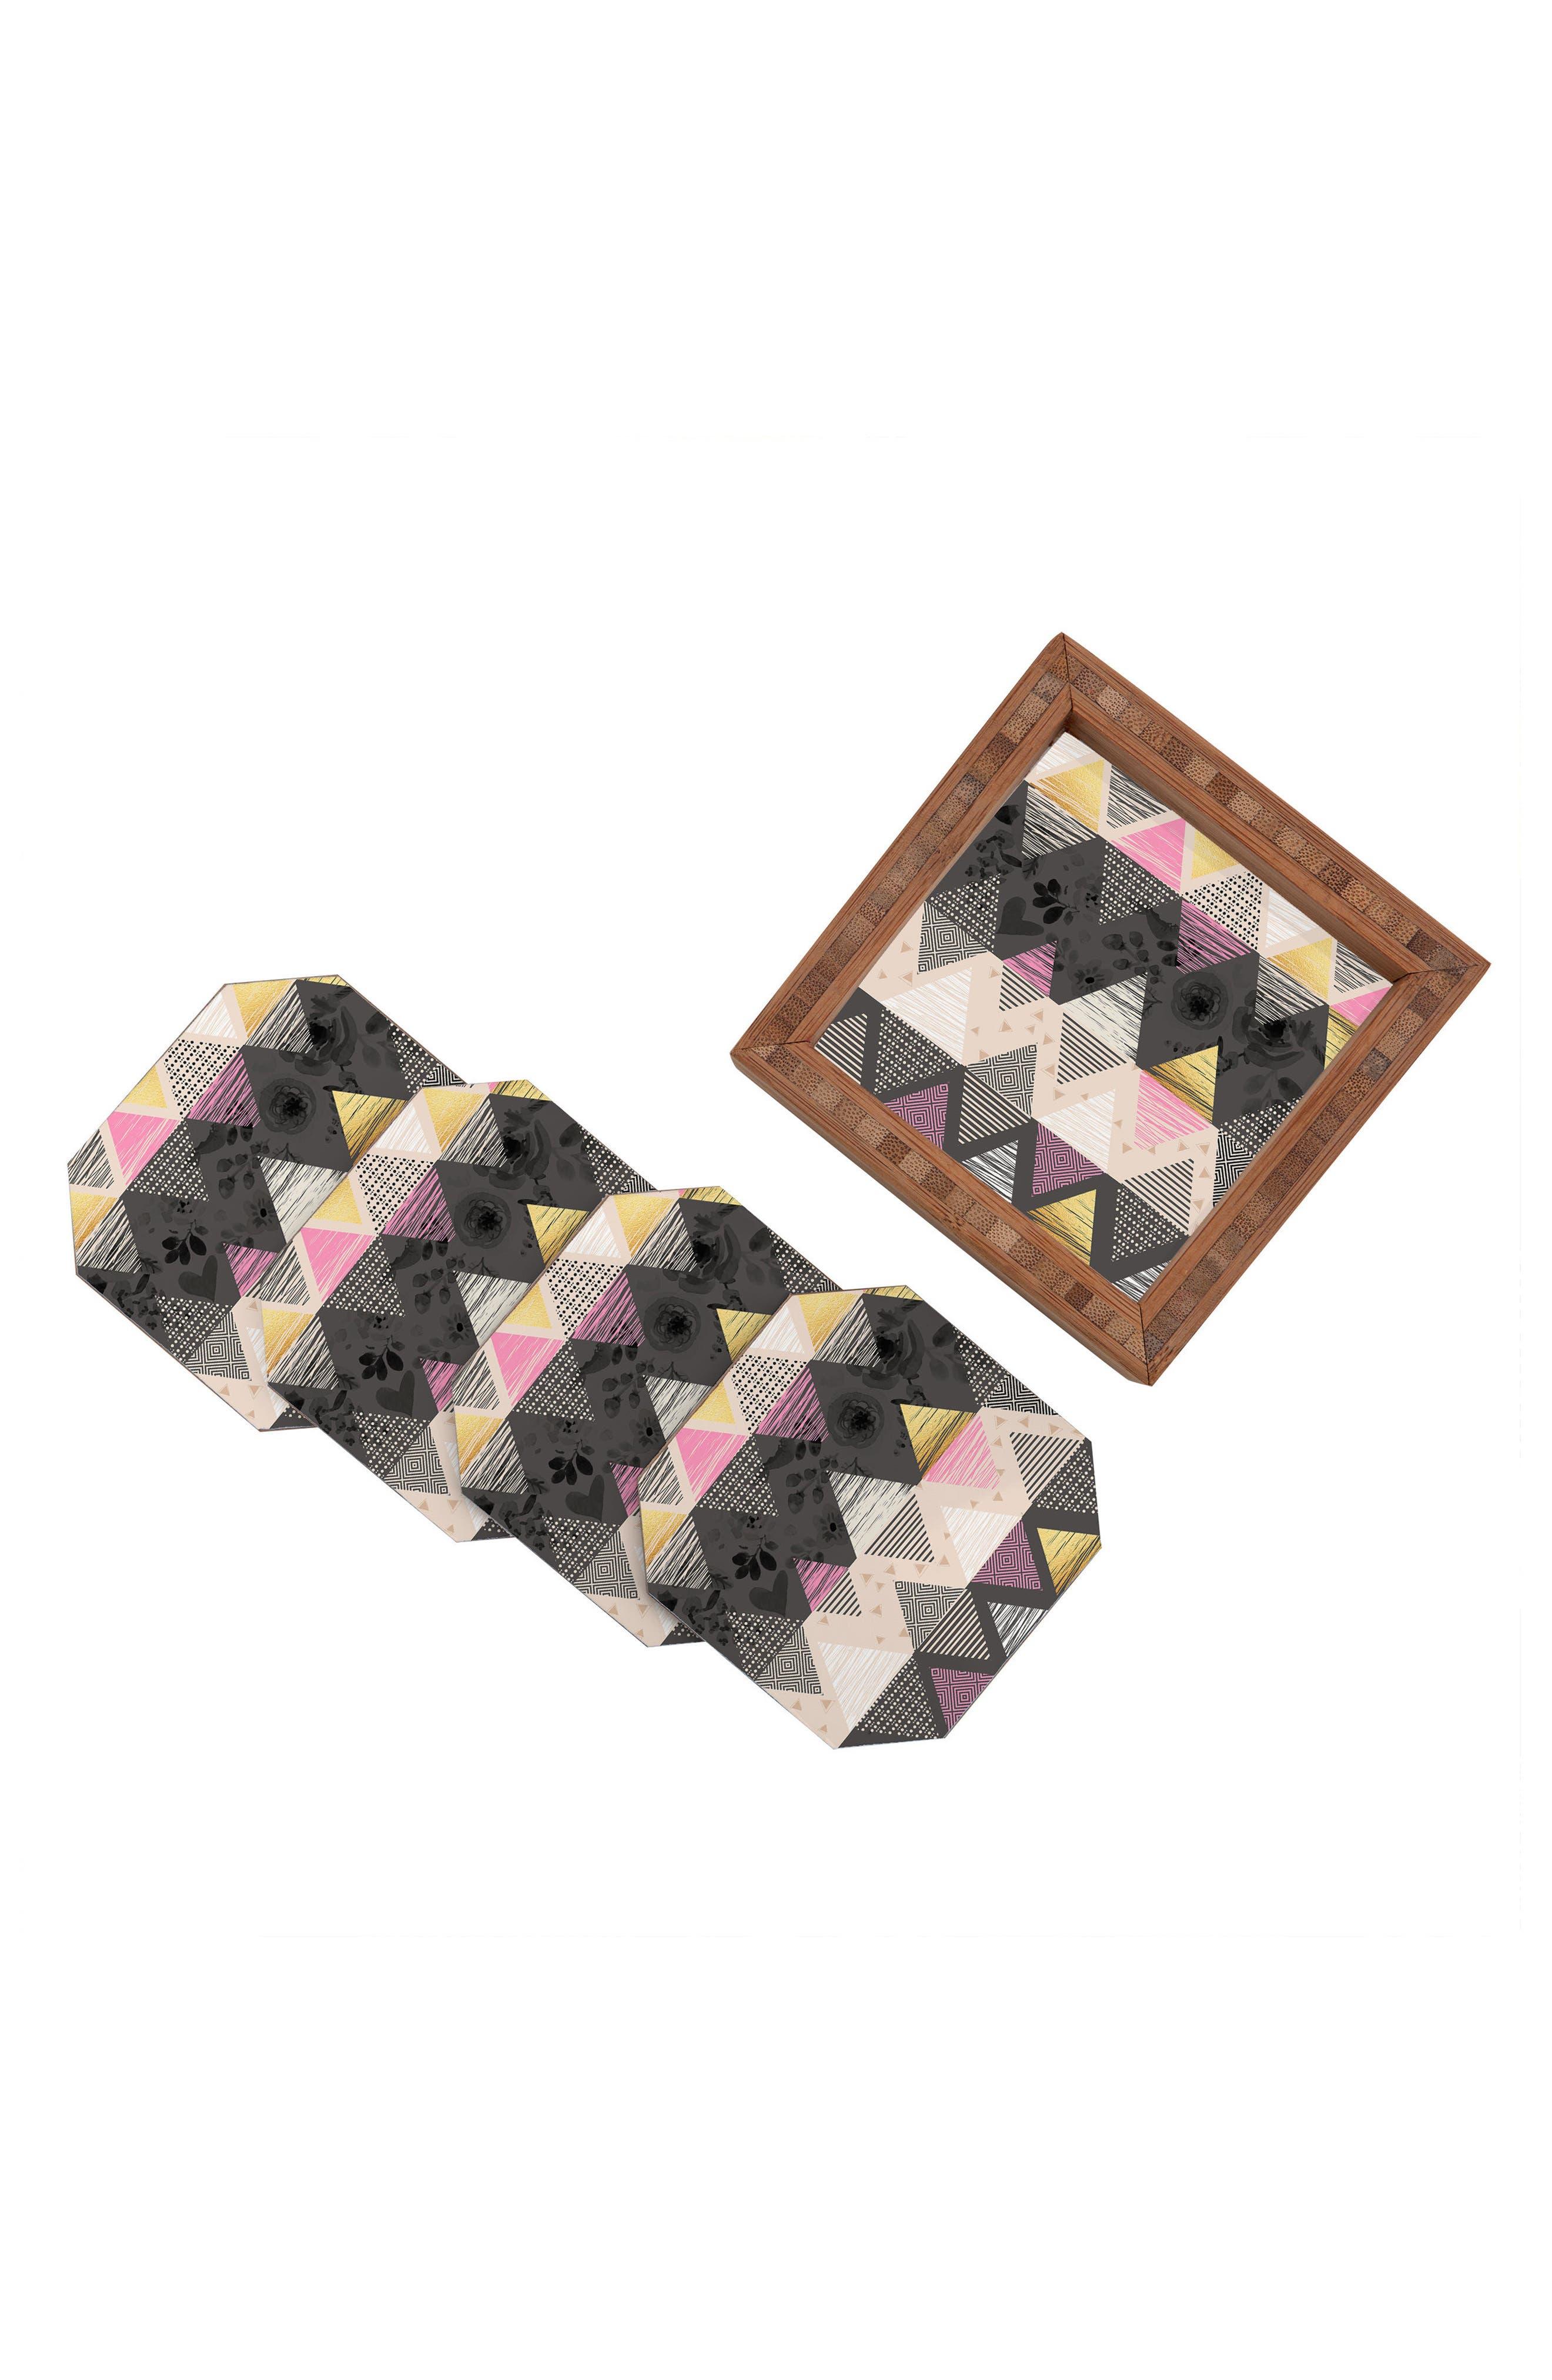 Geometric Set of 4 Coasters,                             Alternate thumbnail 2, color,                             001